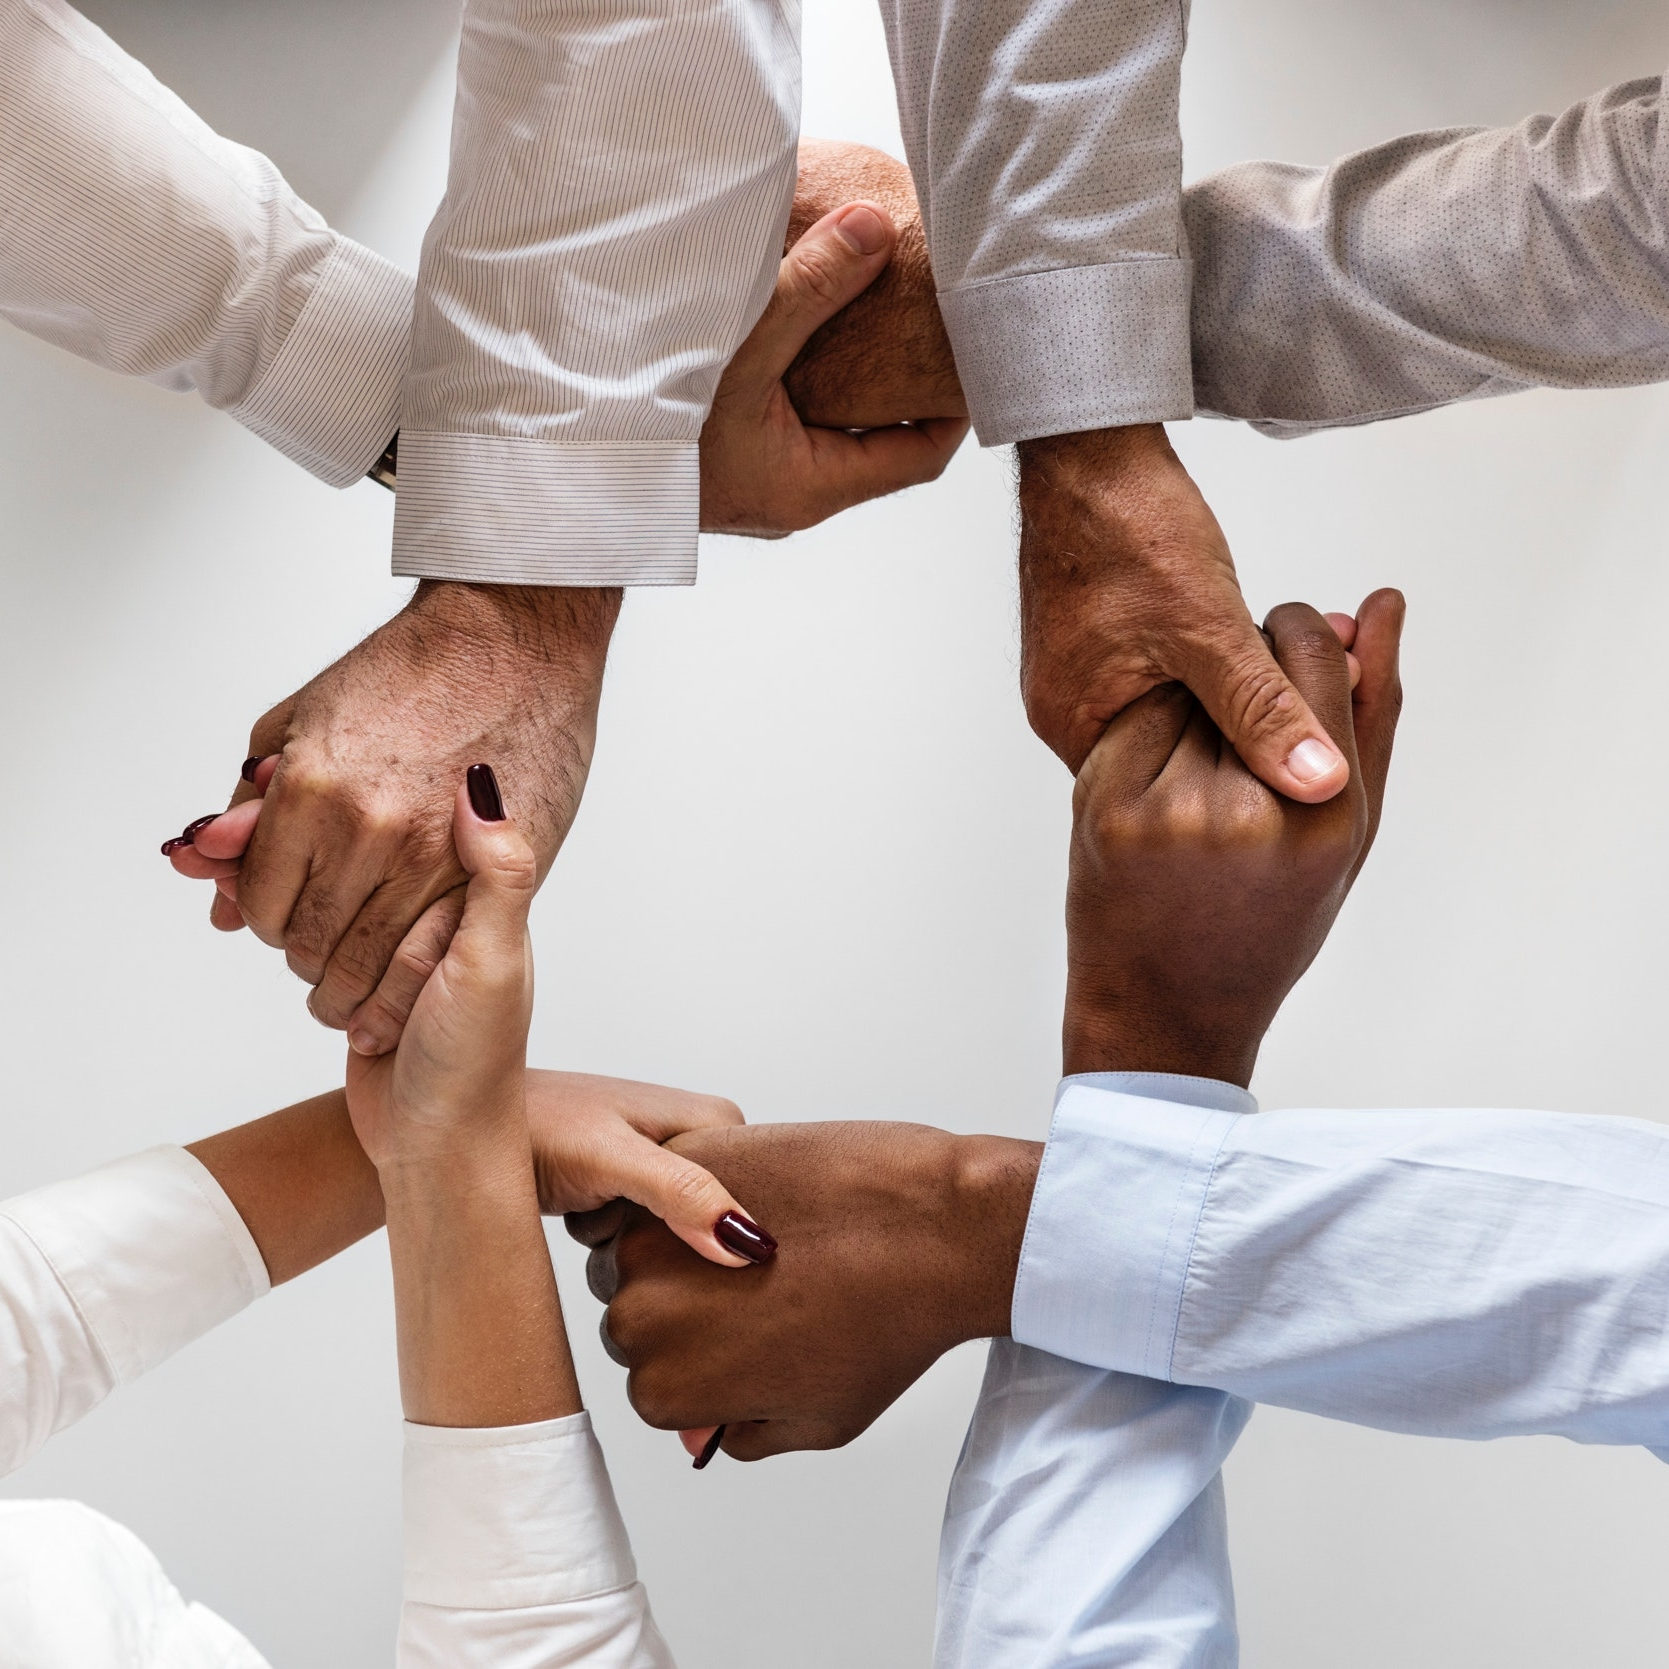 black-collaboration-cooperation-943630.jpg